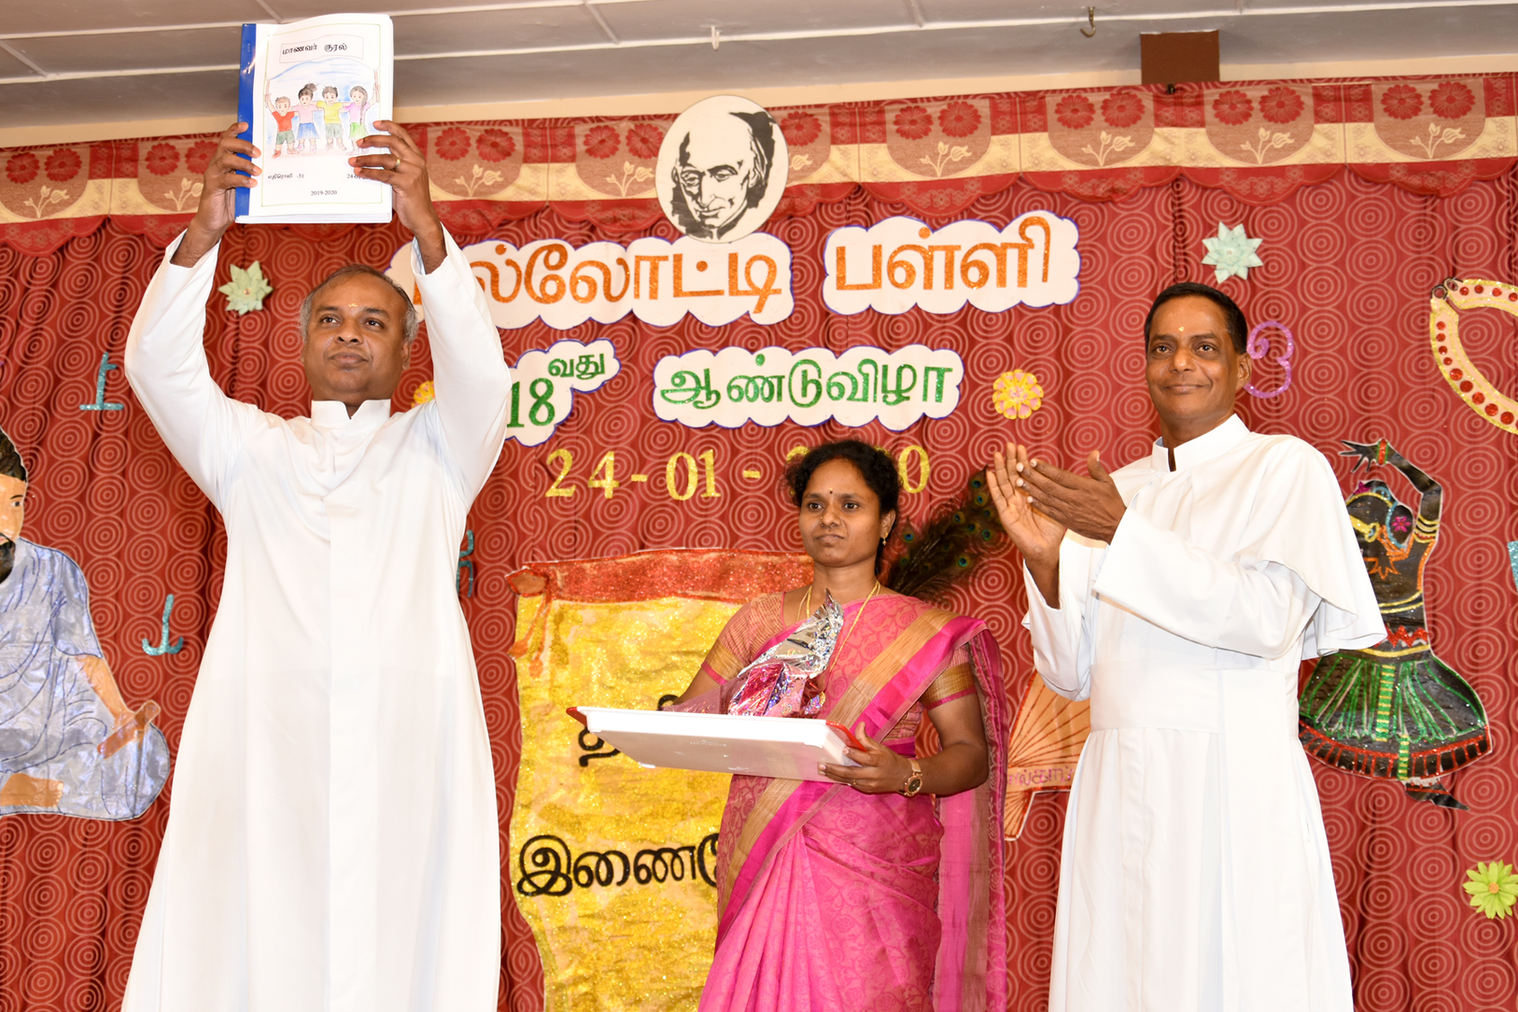 Students' hand written magazine - Manavar Kural - being released by. Fr. Anto Vijayan, SAC